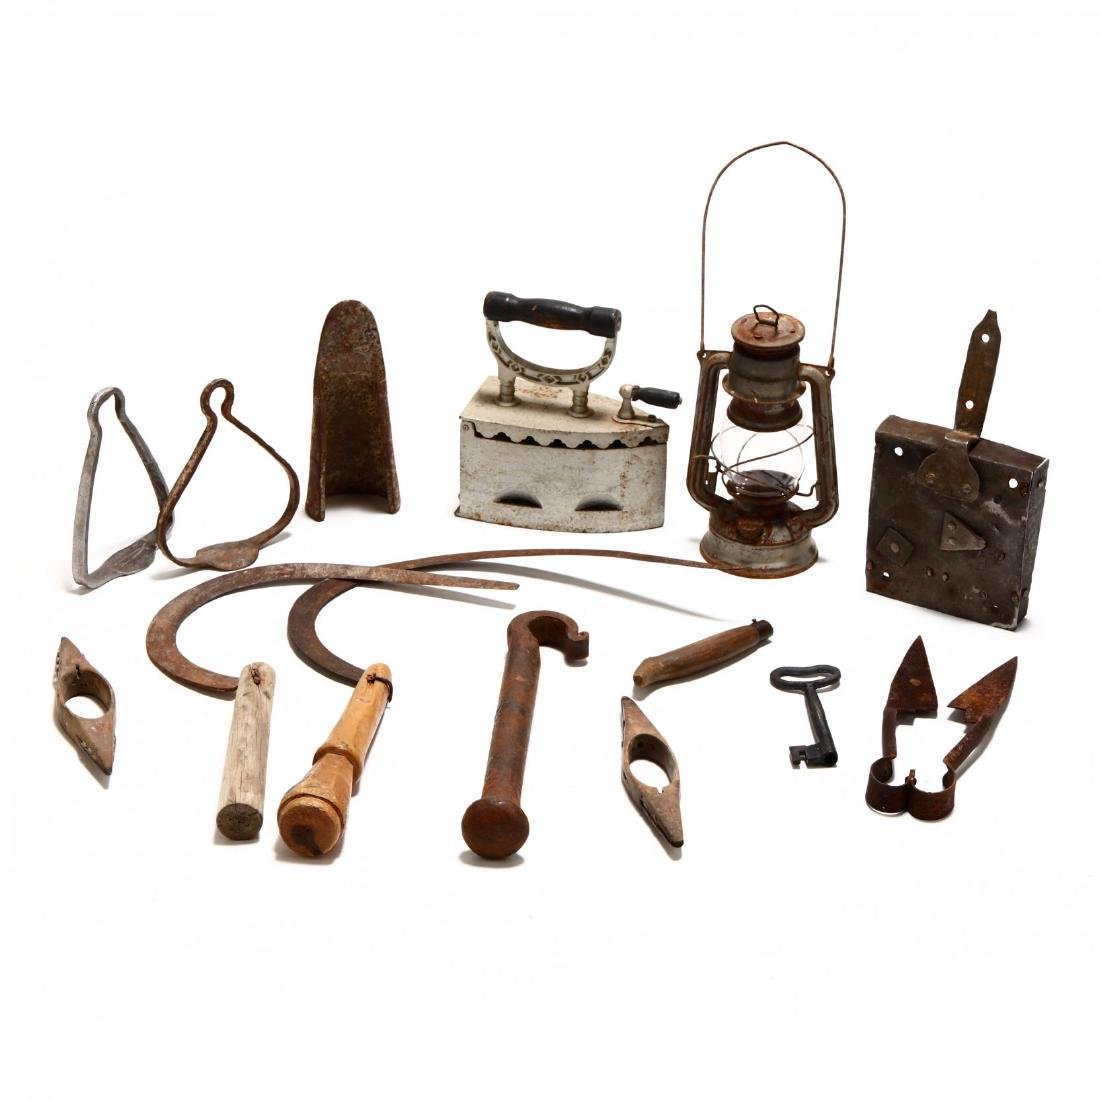 Large Assortment of Vintage Tools